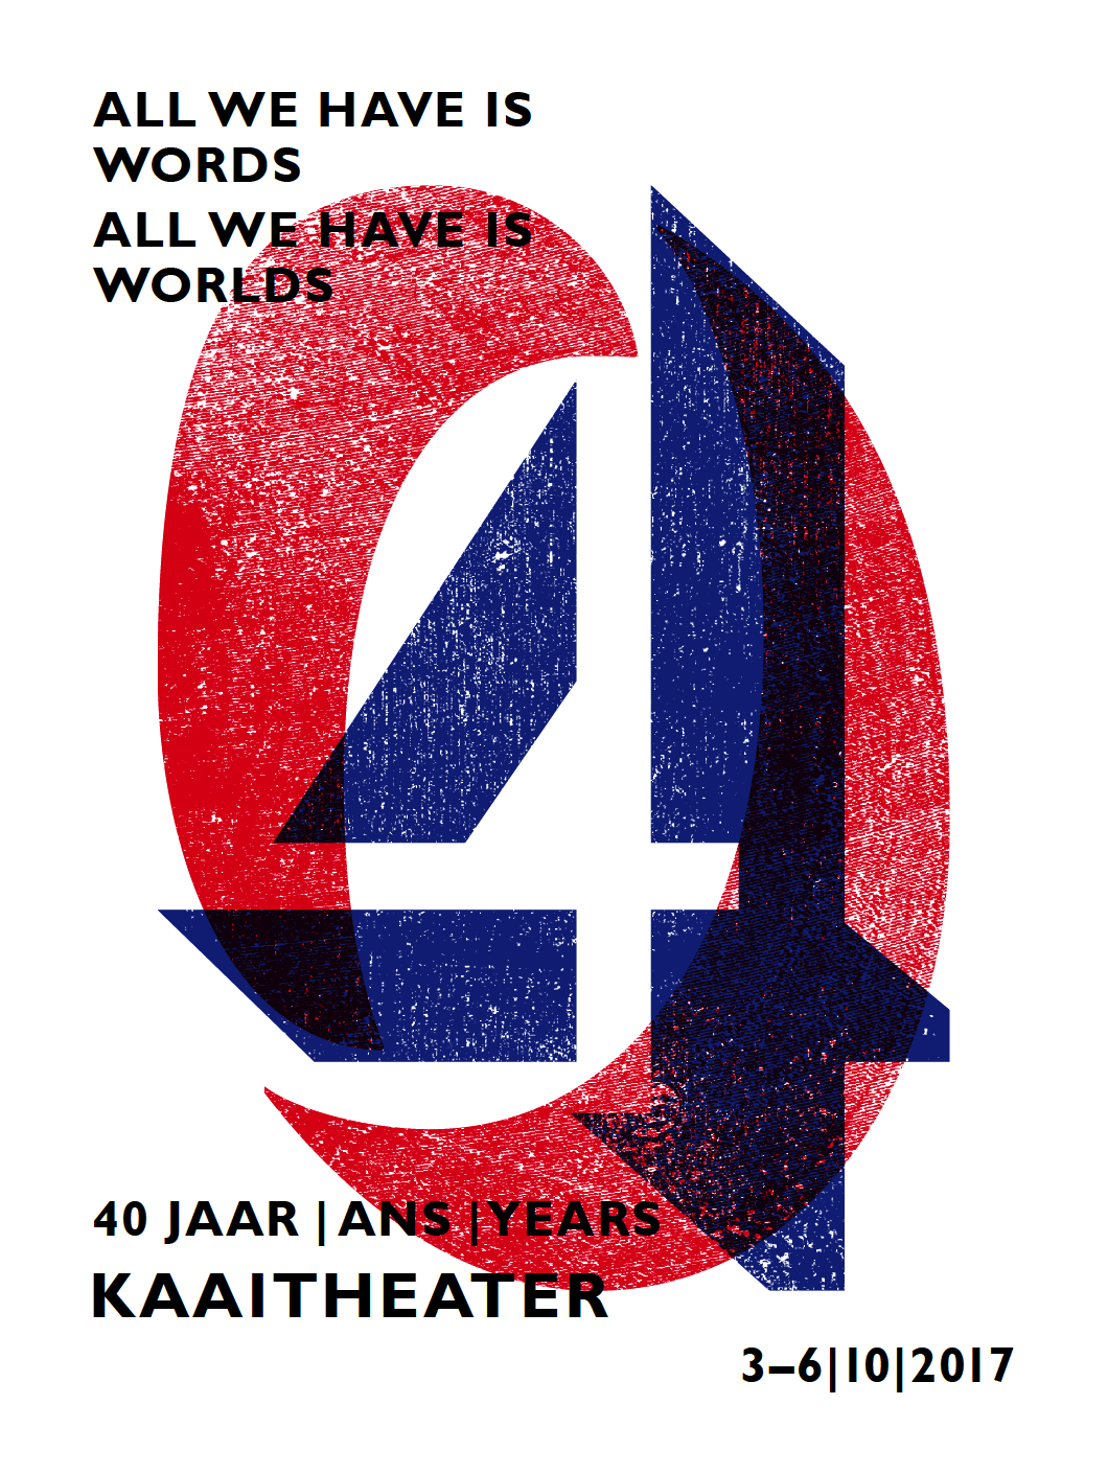 40 ans Kaaitheater - programme d'anniversaire 3>6/10/2017